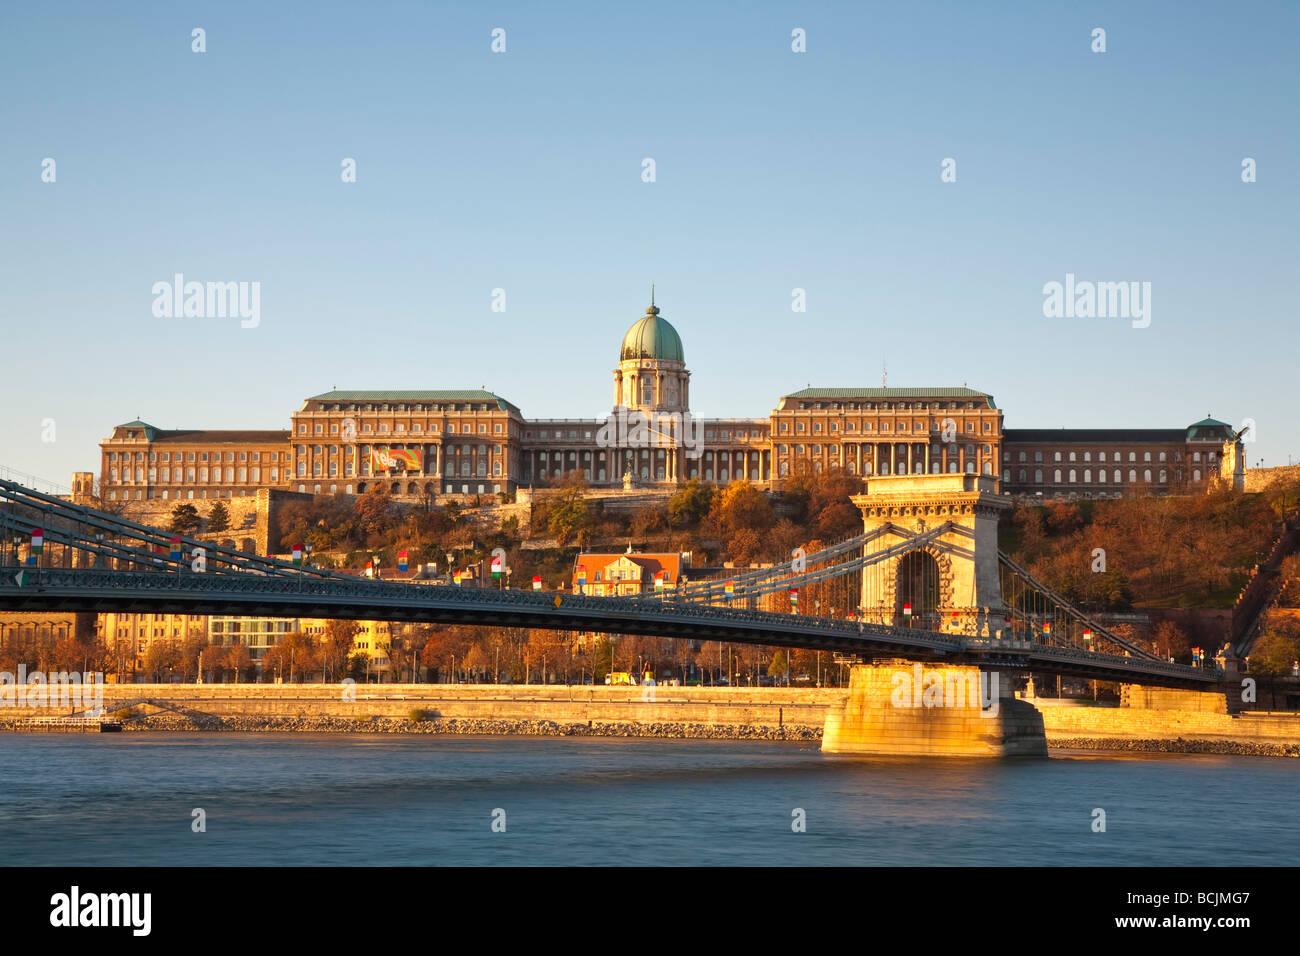 Chain Bridge & Royal Palace on Castle Hill, Budapest, Hungary, RF - Stock Image